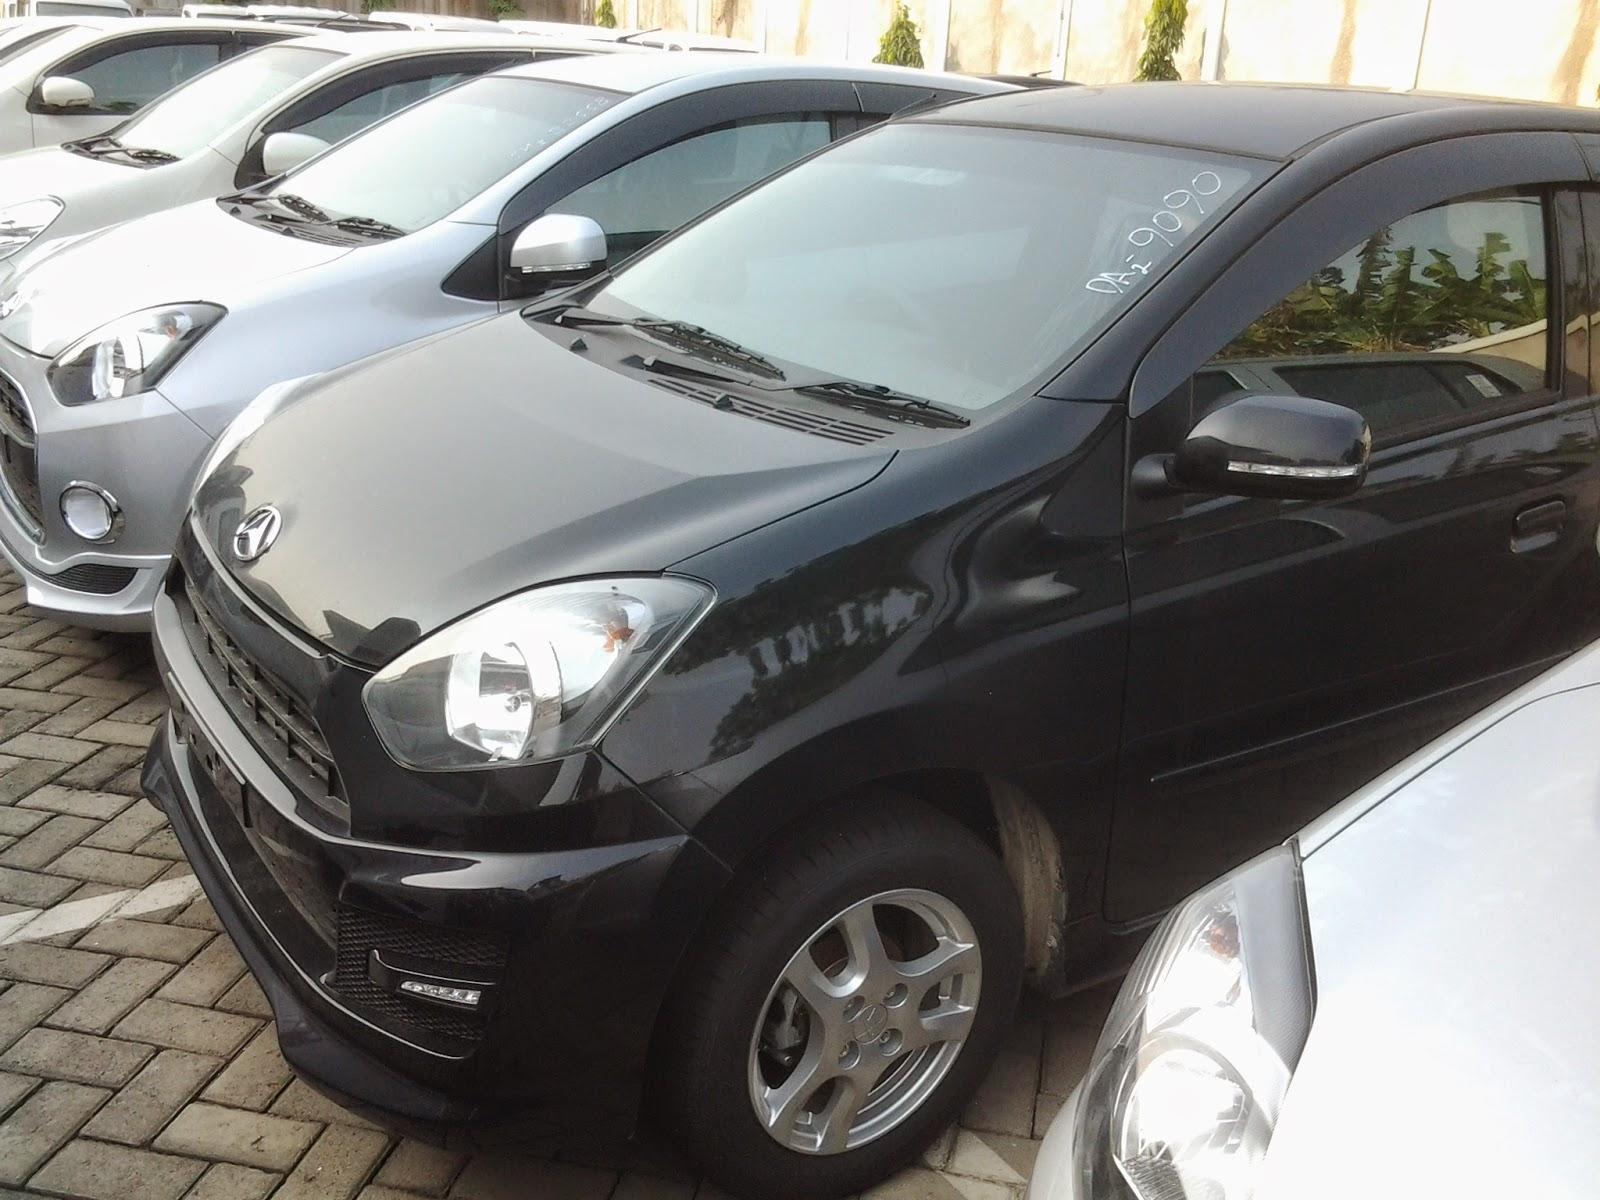 Penawaran Mobil Baru Merek Daihatsu Ayla Type M Sporty